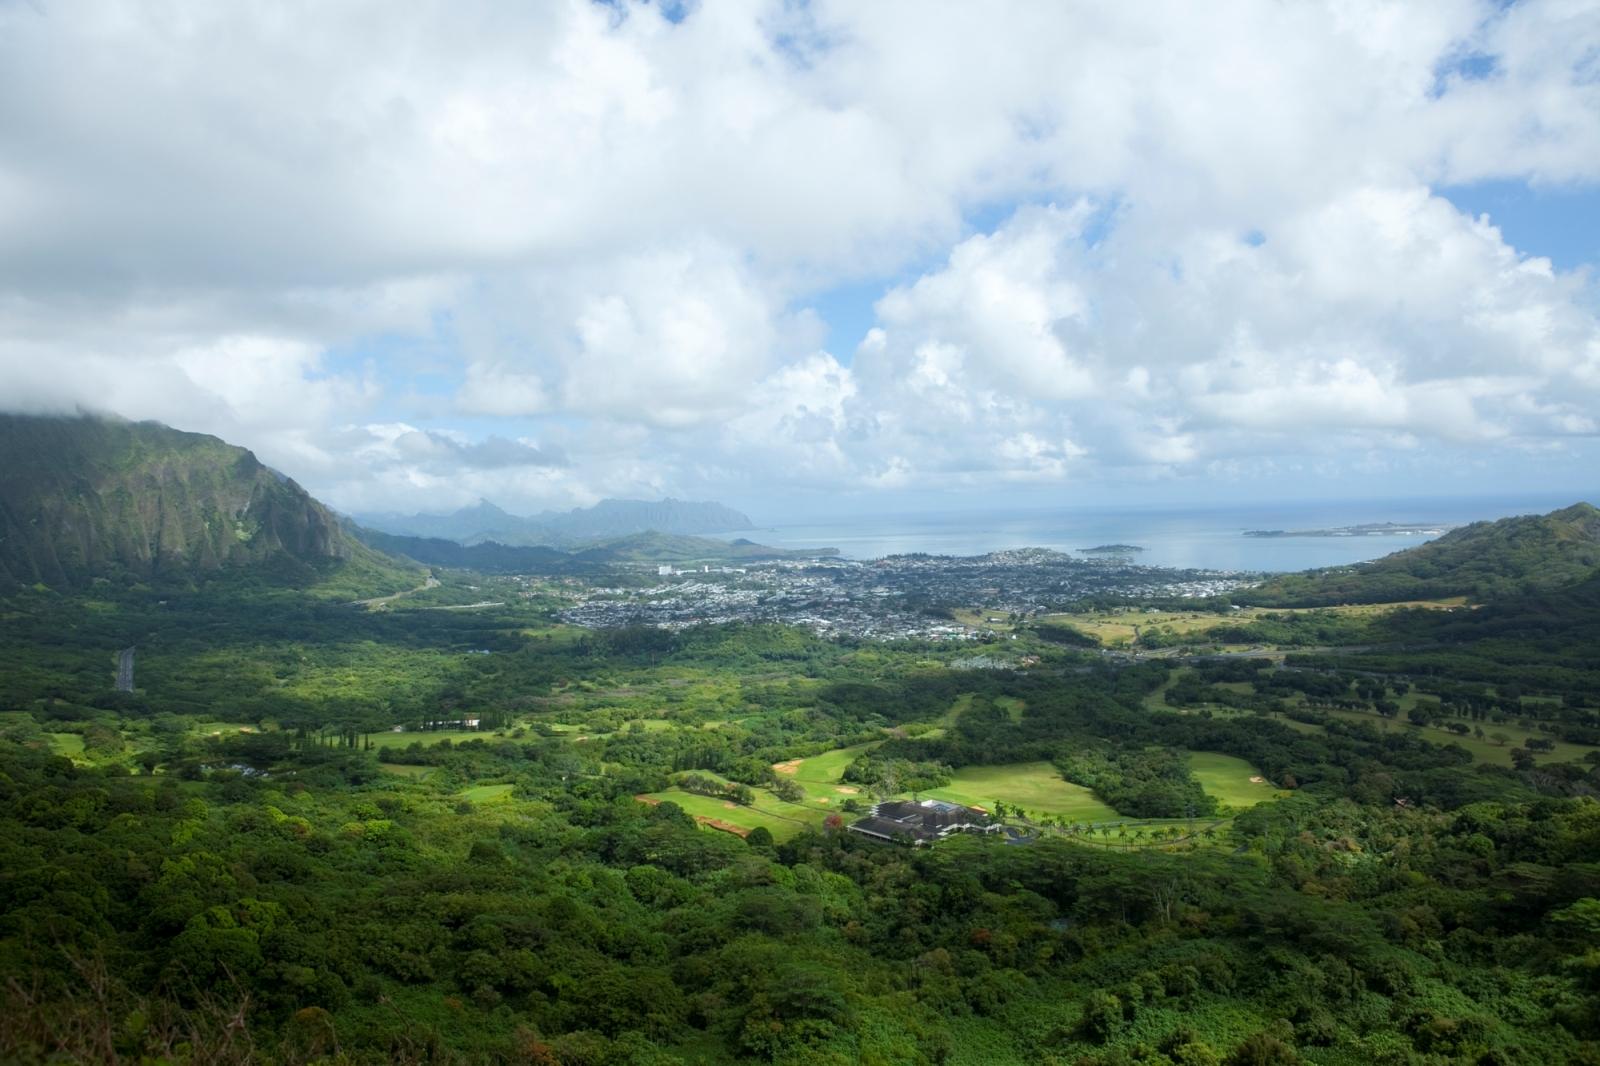 Hawaii Tourism Authority ( HTA)/Daeja Faris